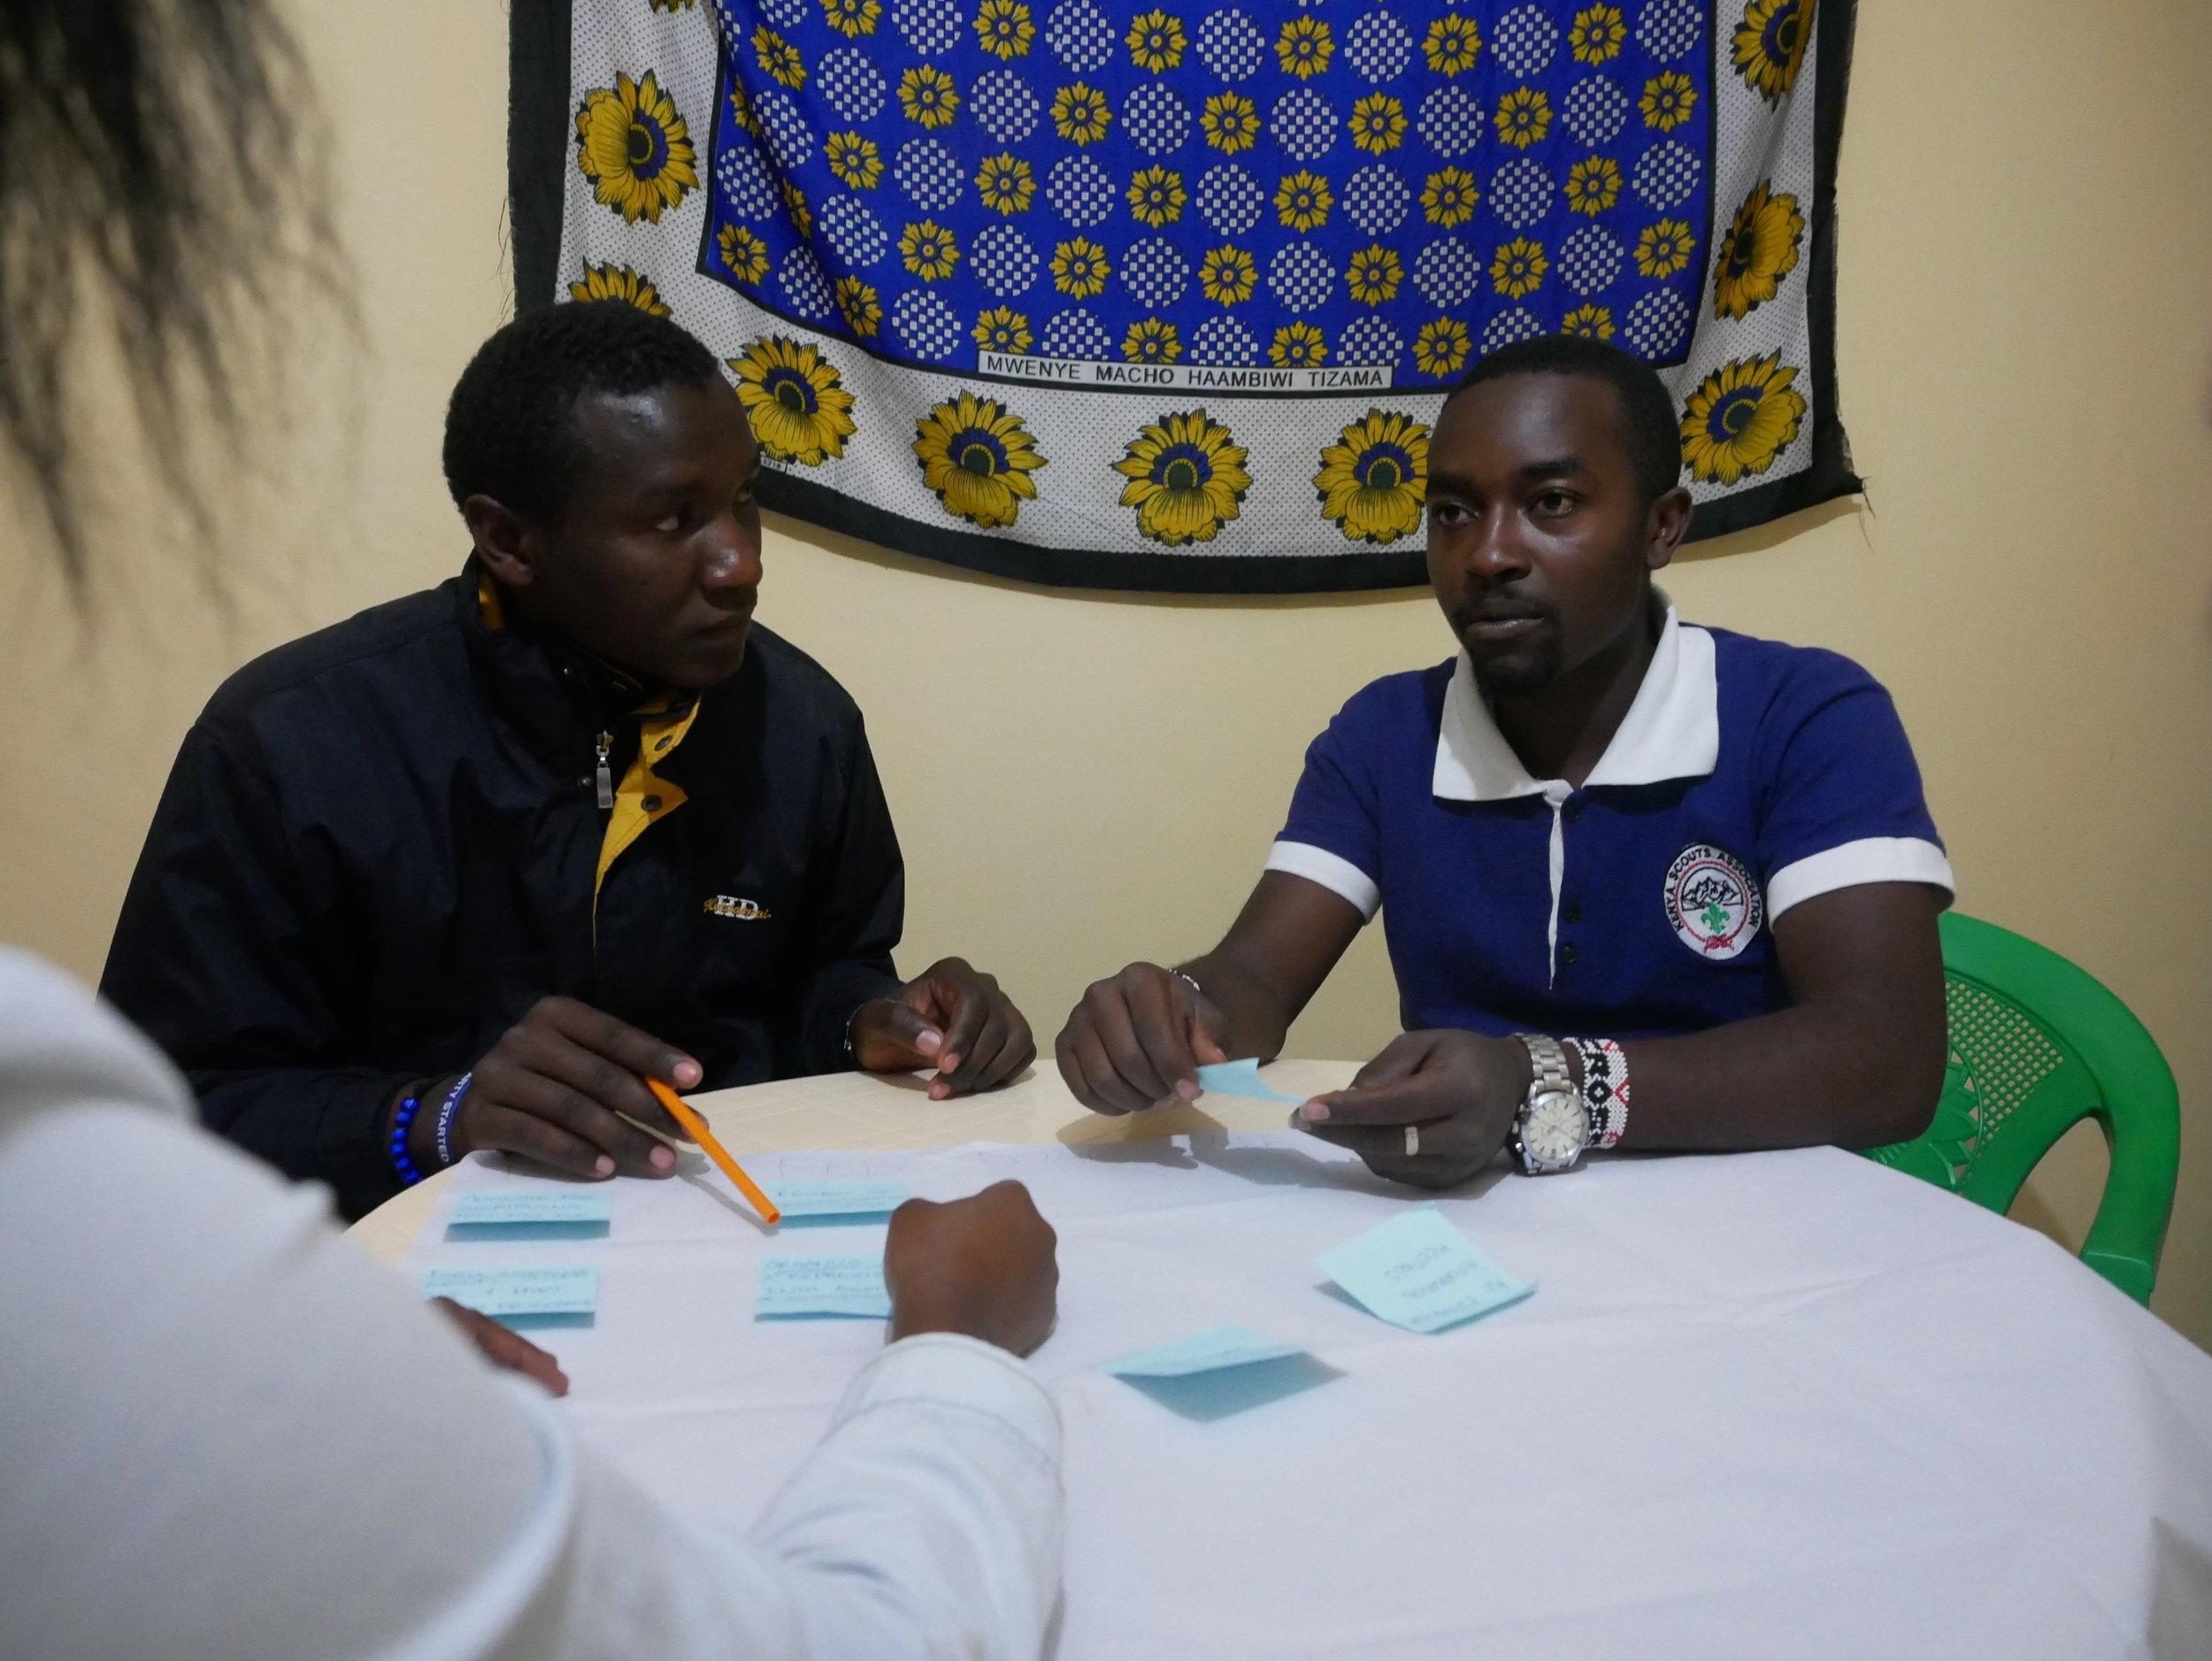 BYC members Moses Muriuki and Peter Mugweru. Photo: Elfi Thrane Bemelmans.